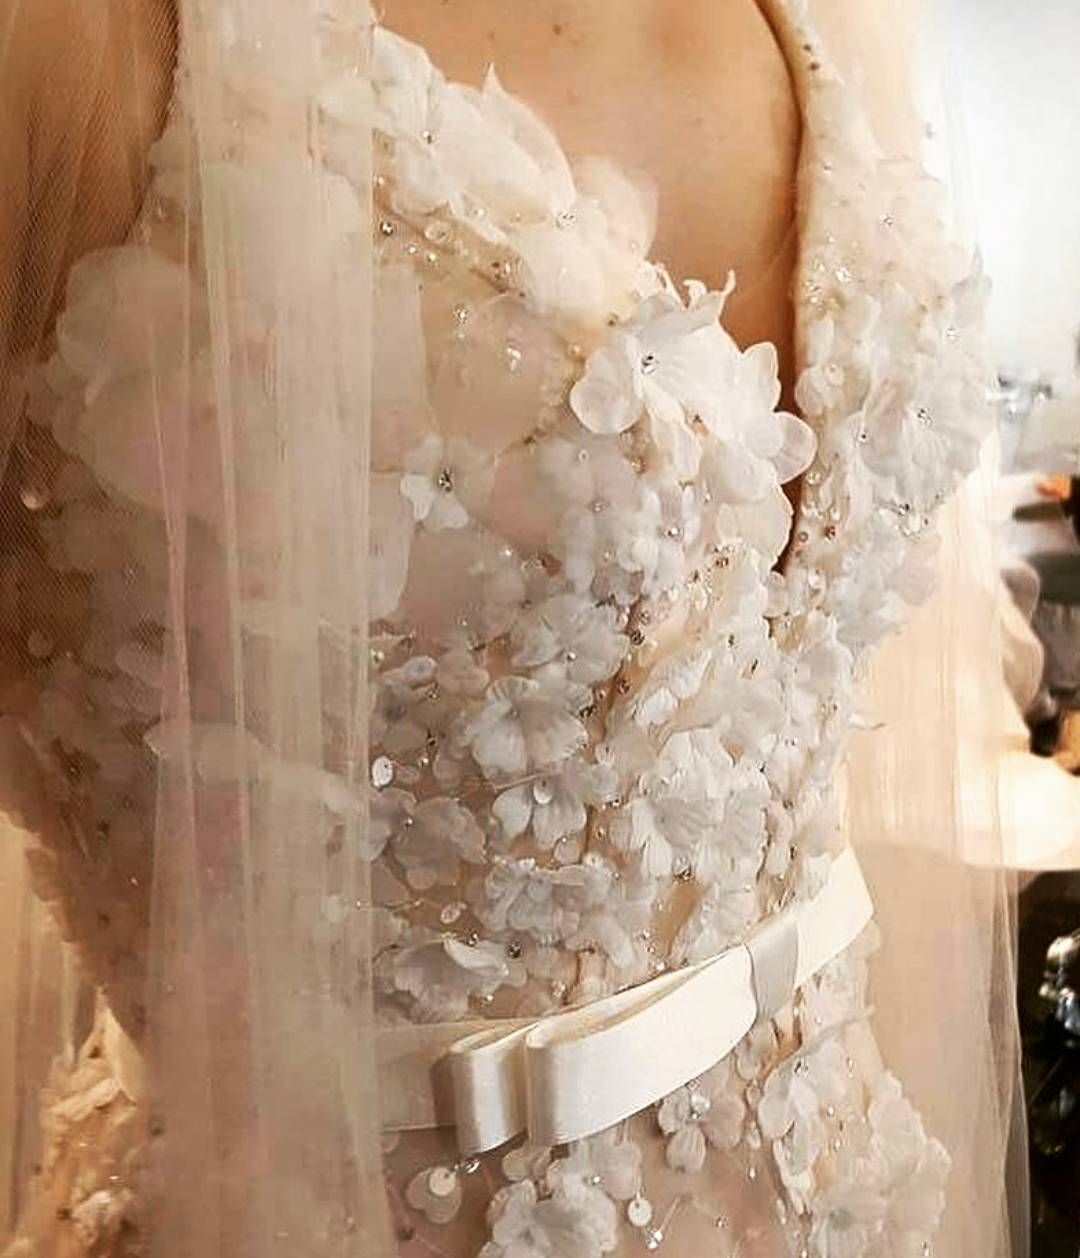 #gelin #gelinlik #gelinlikler #gelinlikmodelleri #weddedwonderland #russia #kına #nişan #bride #bridal #bridaldress #wedding #vestidodenoiva #weddingdress #glam #prenses #couture #weddingday #weddingphotography #transparan #hijab #couturefashion #houtecouture #fashion #bohem #transparent #style #bride #amazing #beautifulbride #tbt �� http://gelinshop.com/ipost/1500652326200087963/?code=BTTY1cChRWb